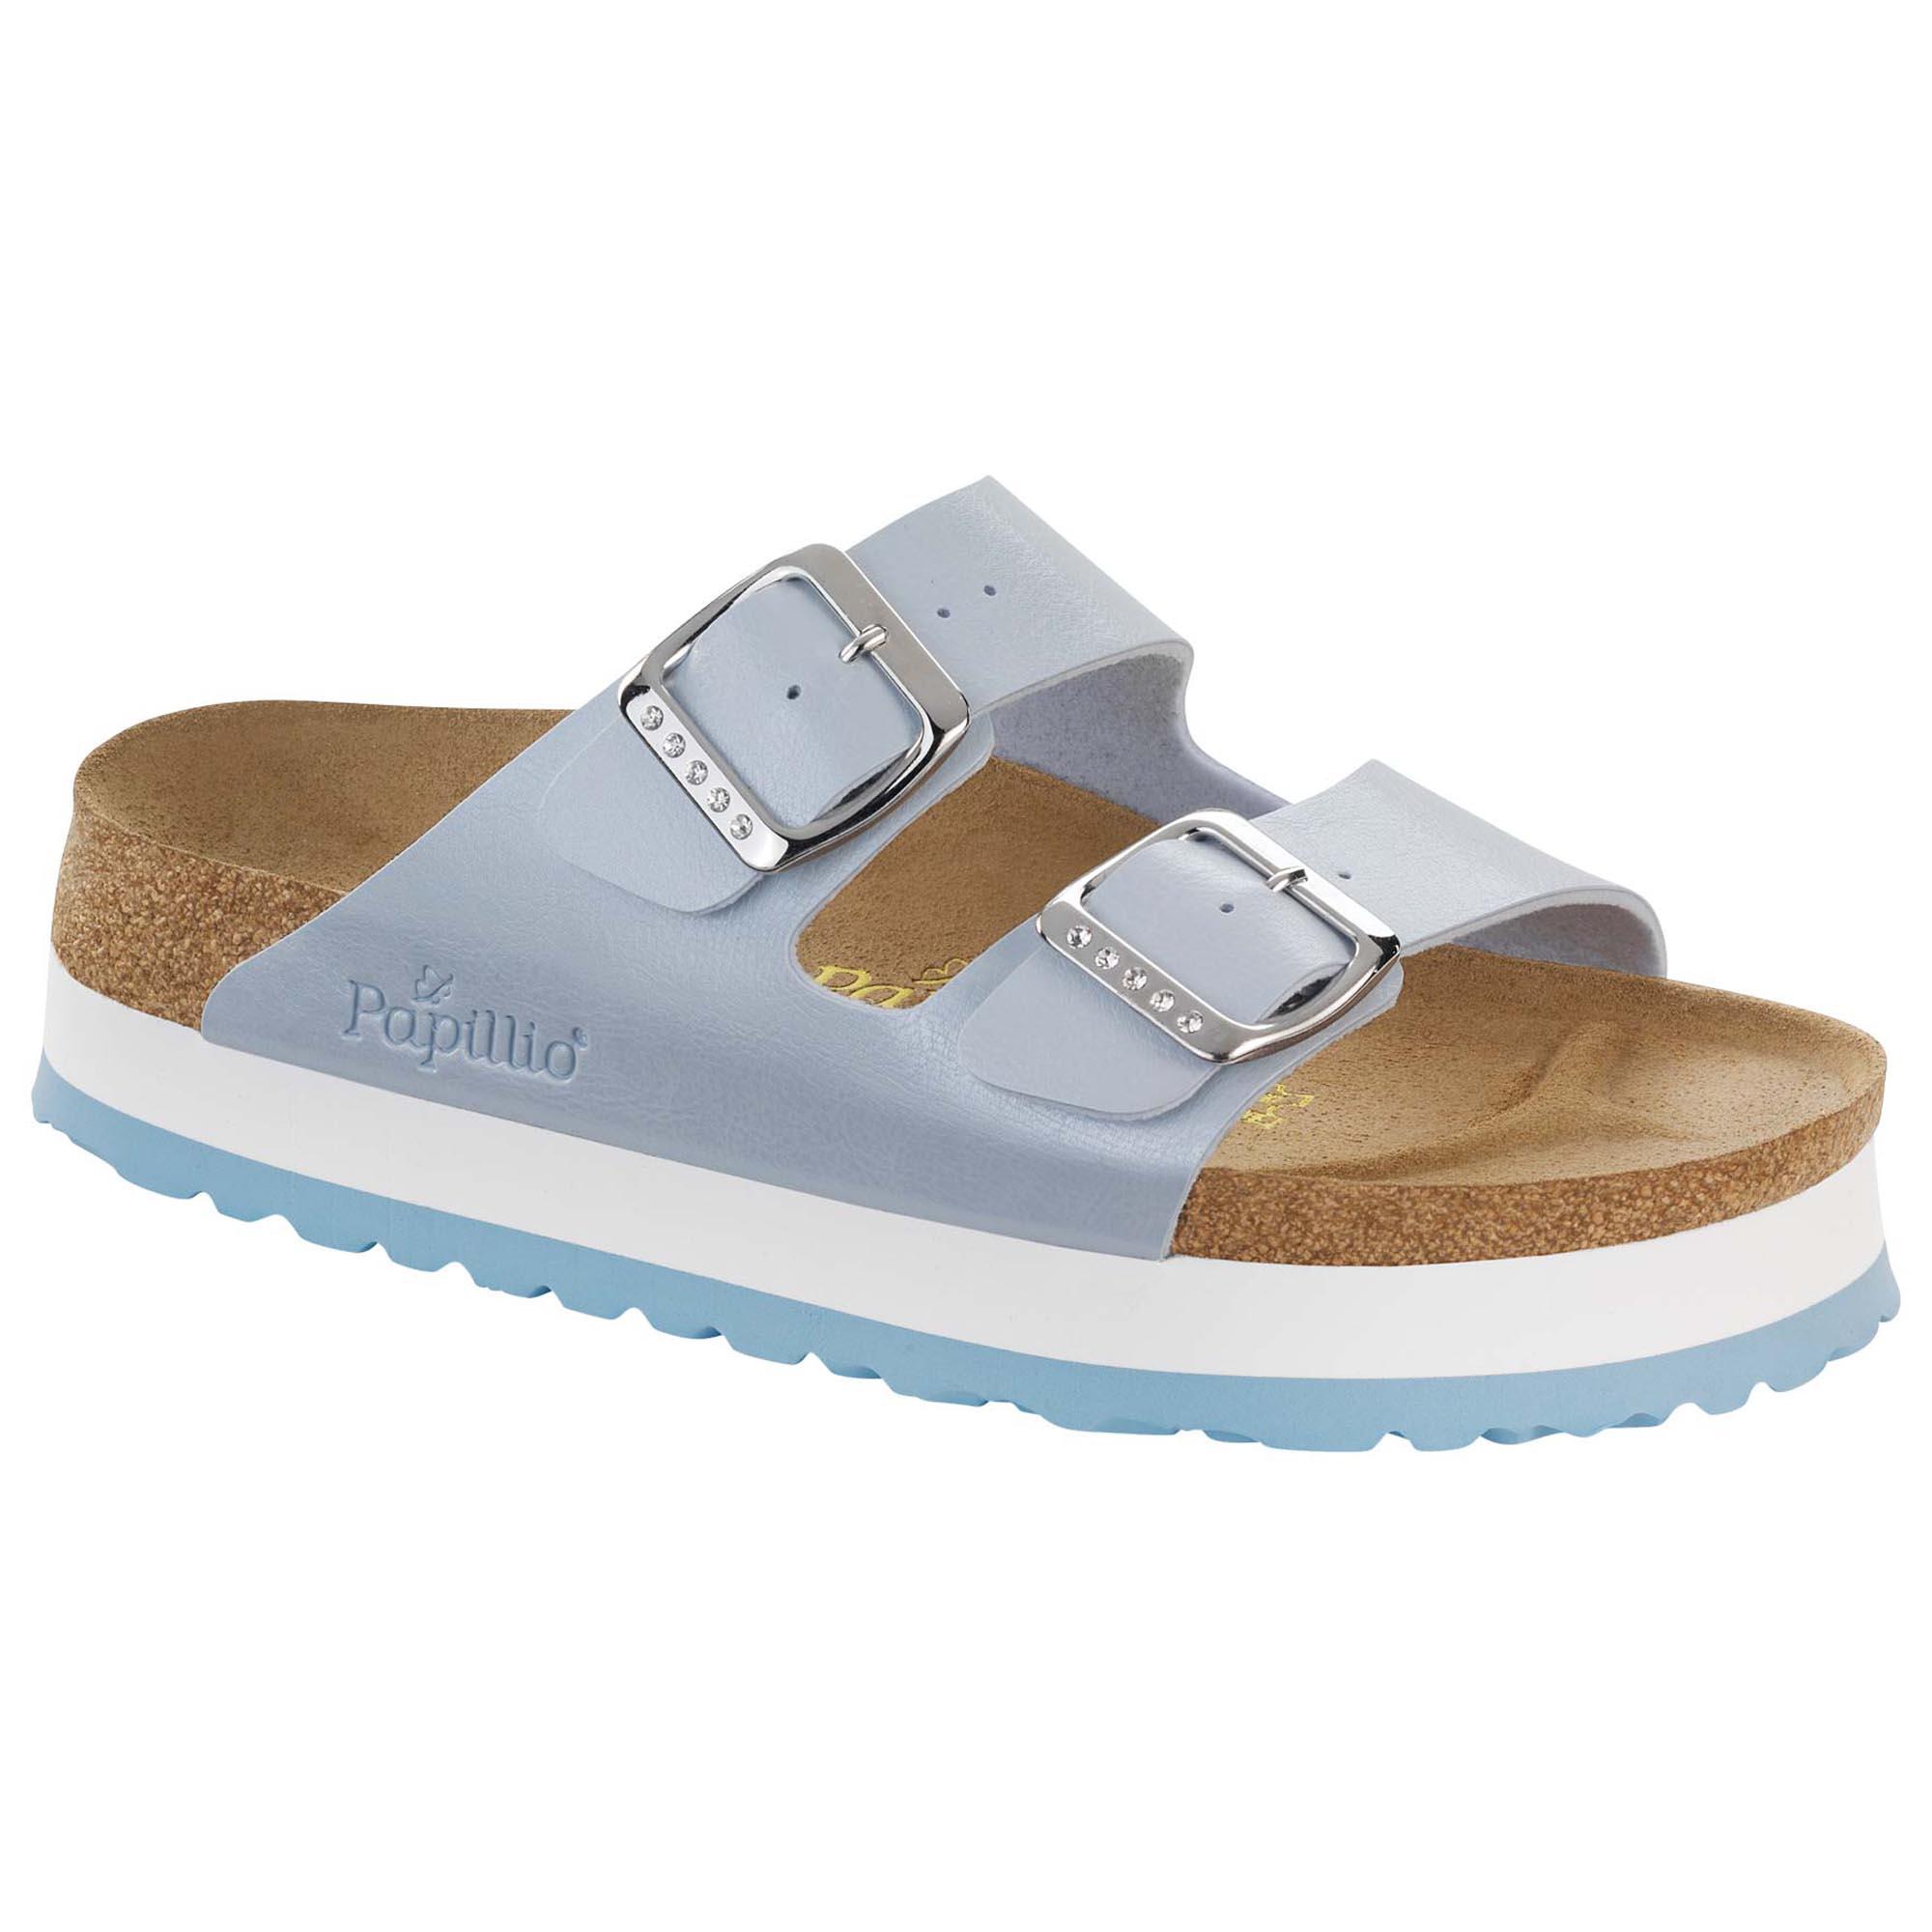 Birkenstock Papillio arizona platform sandals   Luisaviaroma